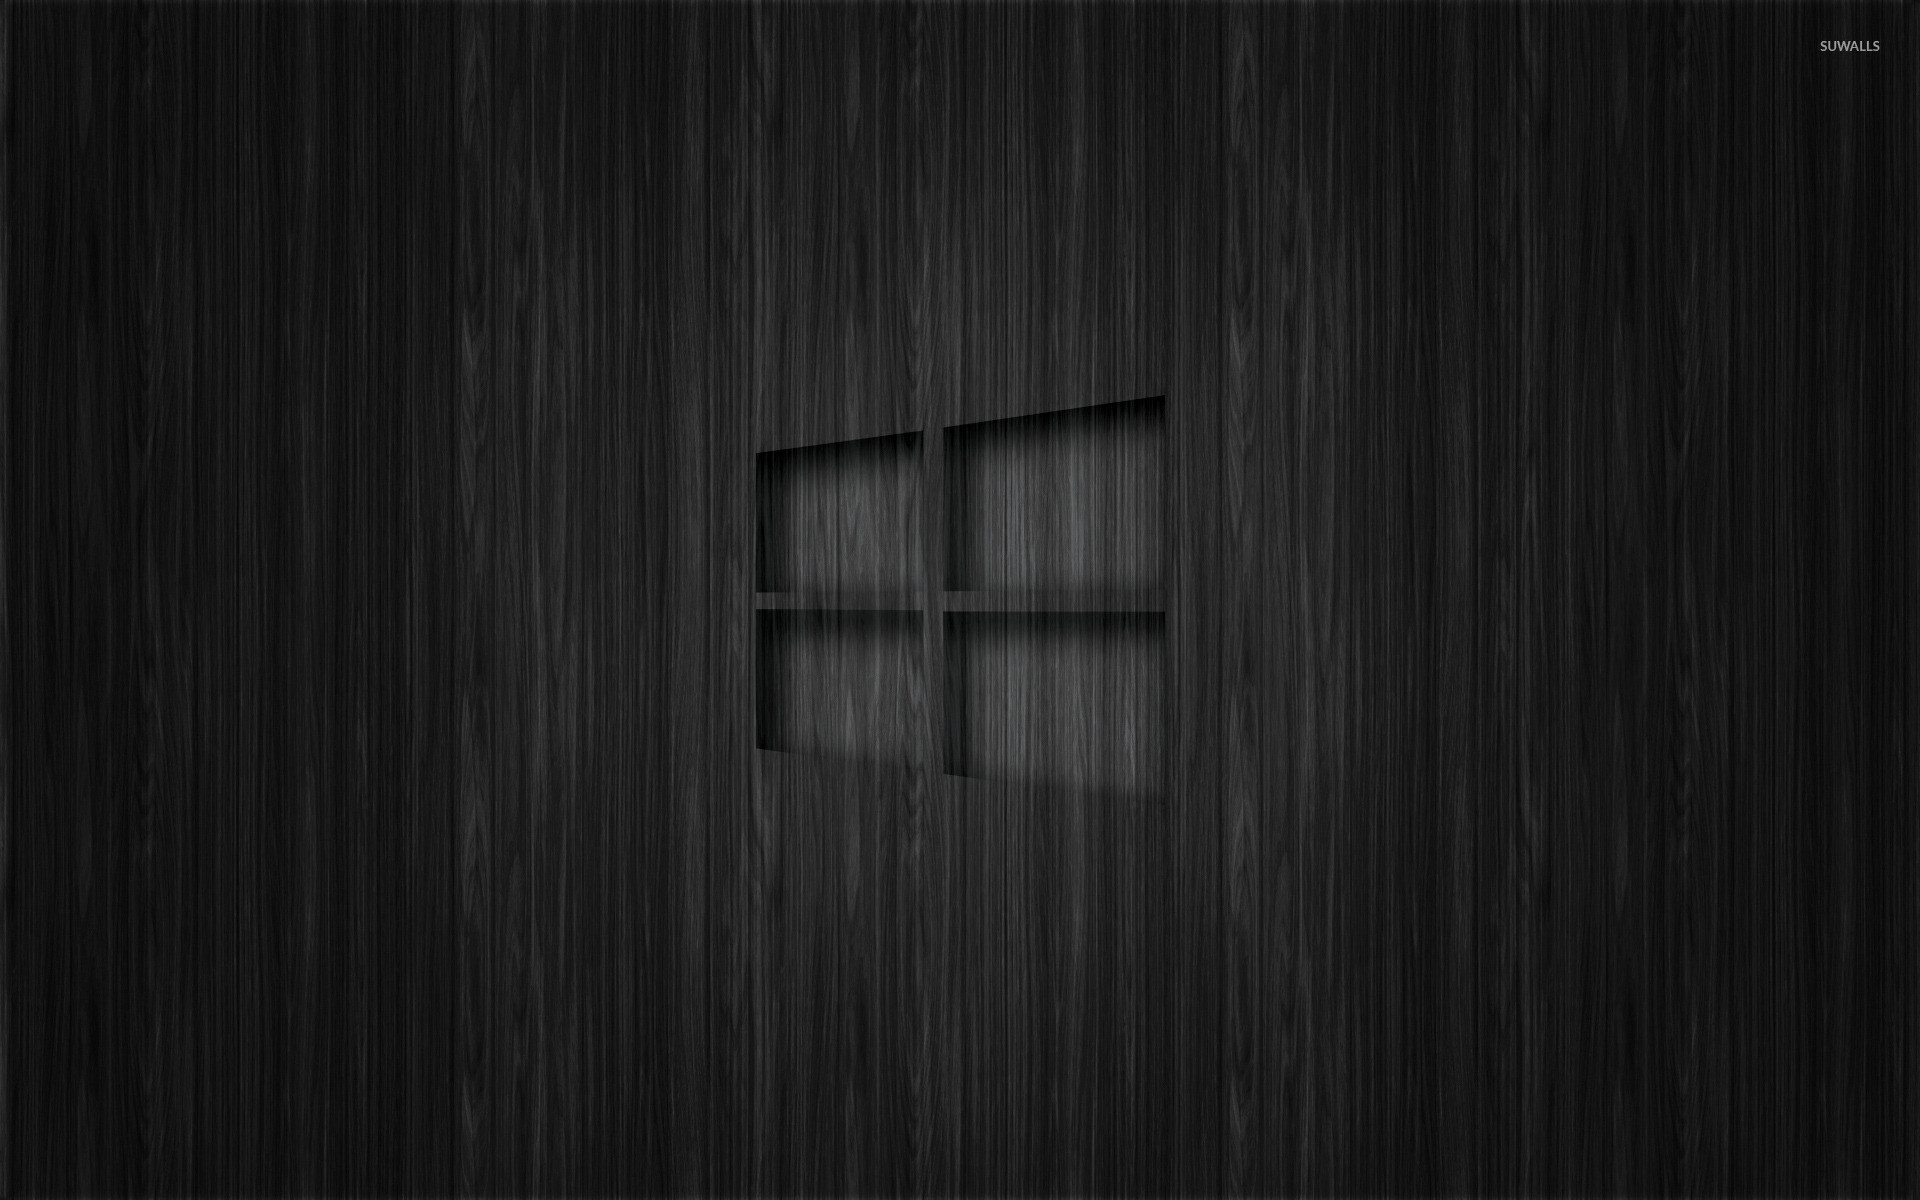 Dark Windows 10 Wallpaper 76 Images